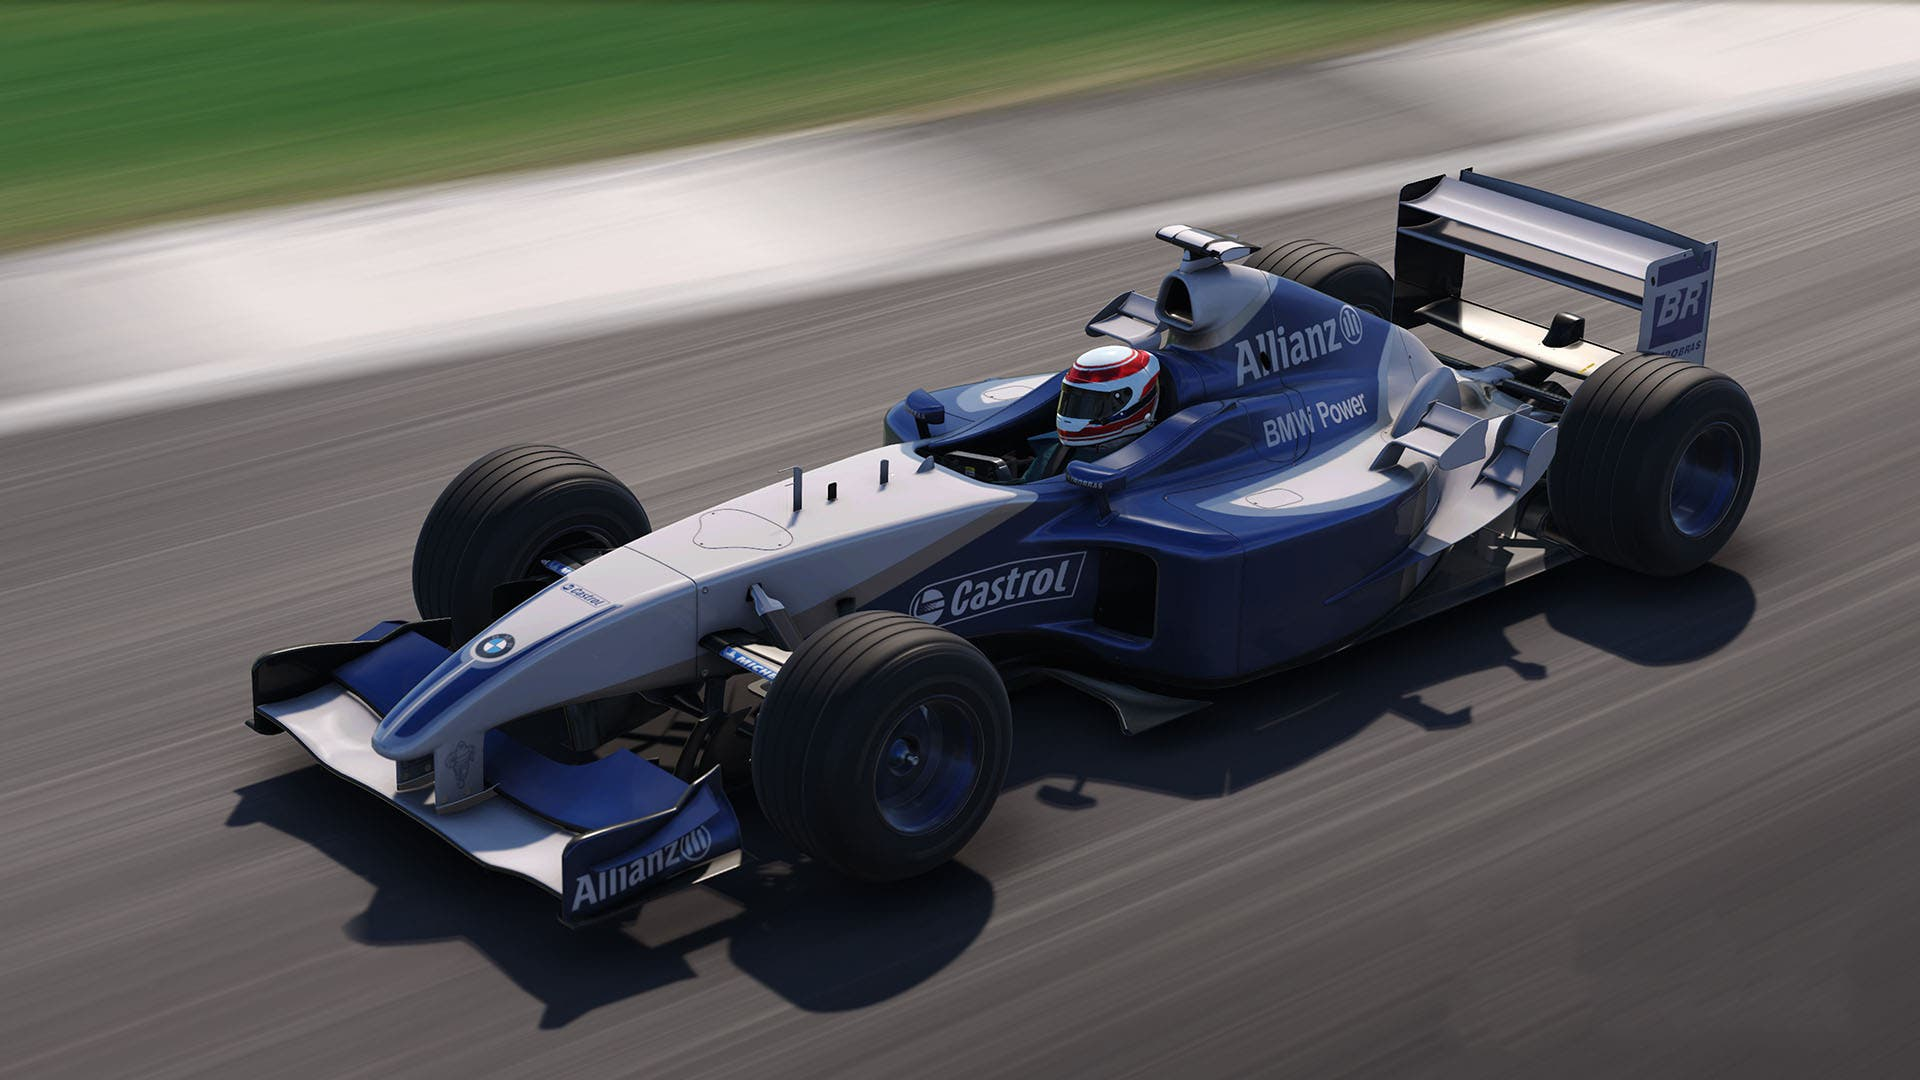 Análisis de F1 2018 - Xbox One 10